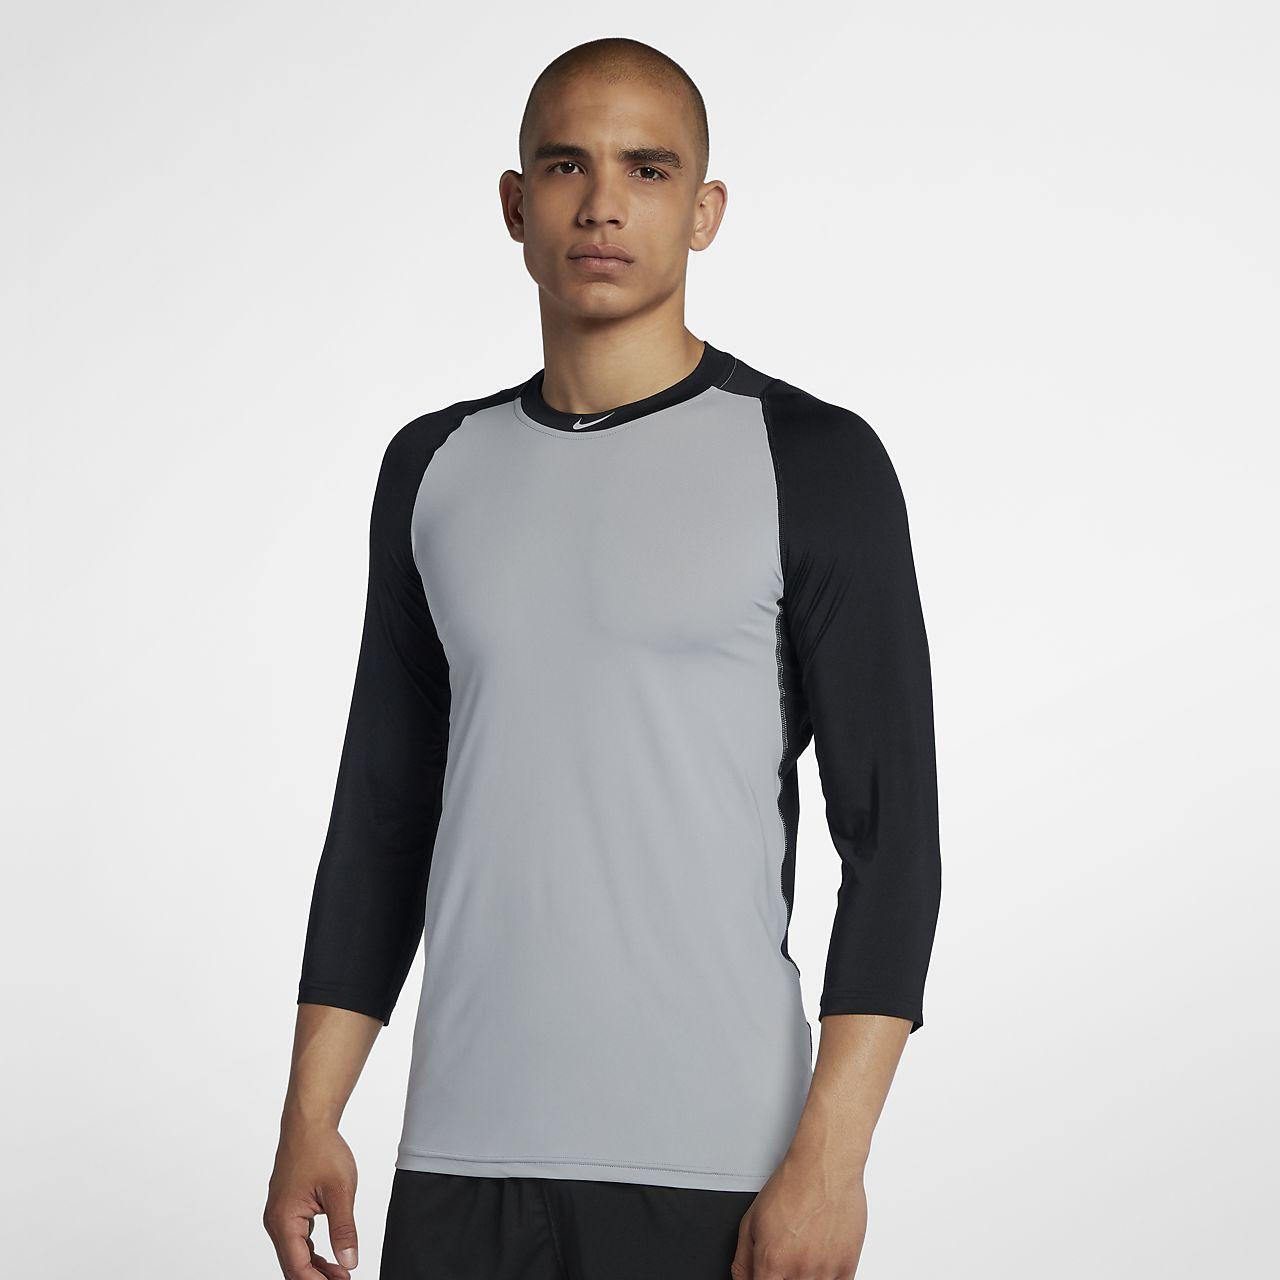 b8afd397 Nike Pro Men's 3/4 Sleeve Baseball Top. Nike.com